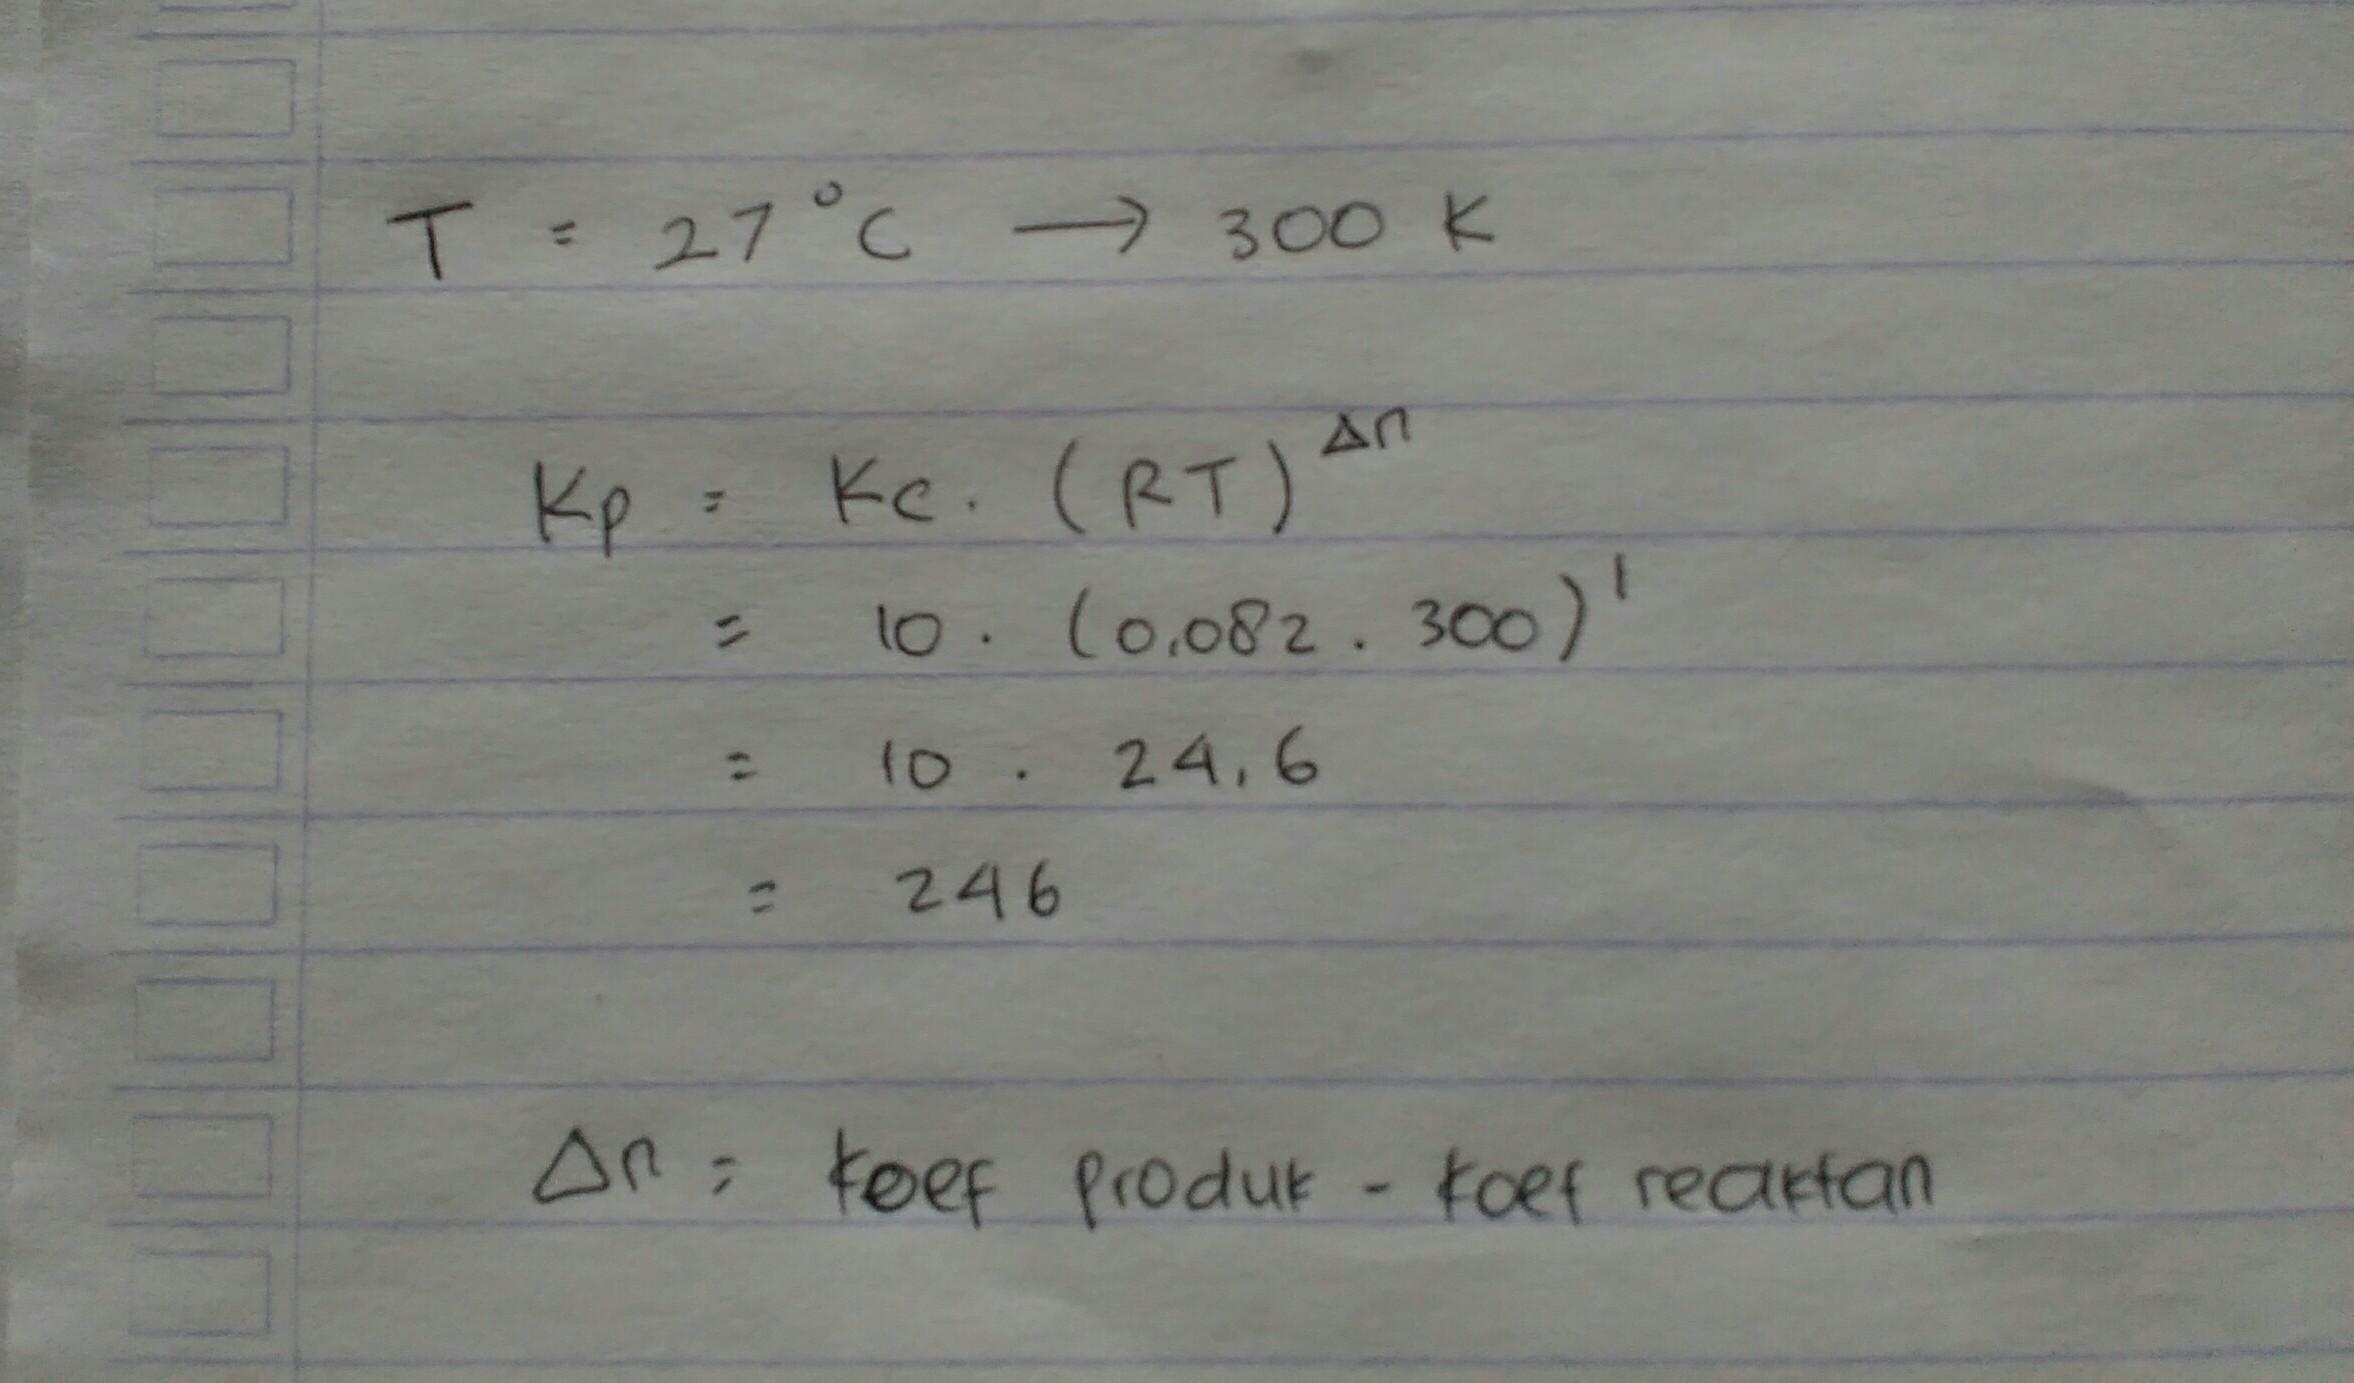 Pada suhu 27 celsius harga Kc untuk reaksi kesetimbangan ...